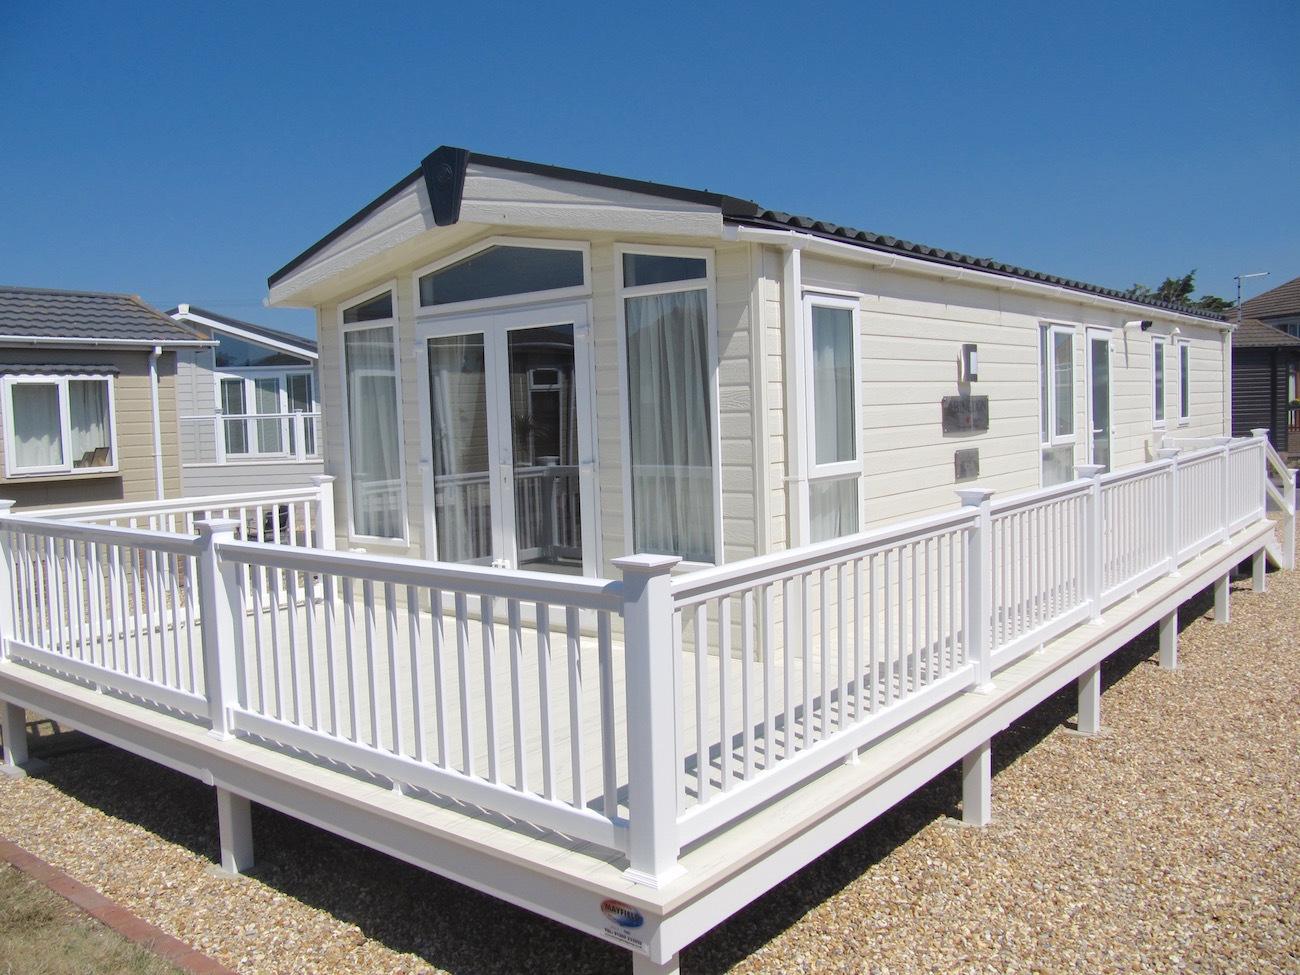 New Pemberton Abingdon for Sale in Lancing